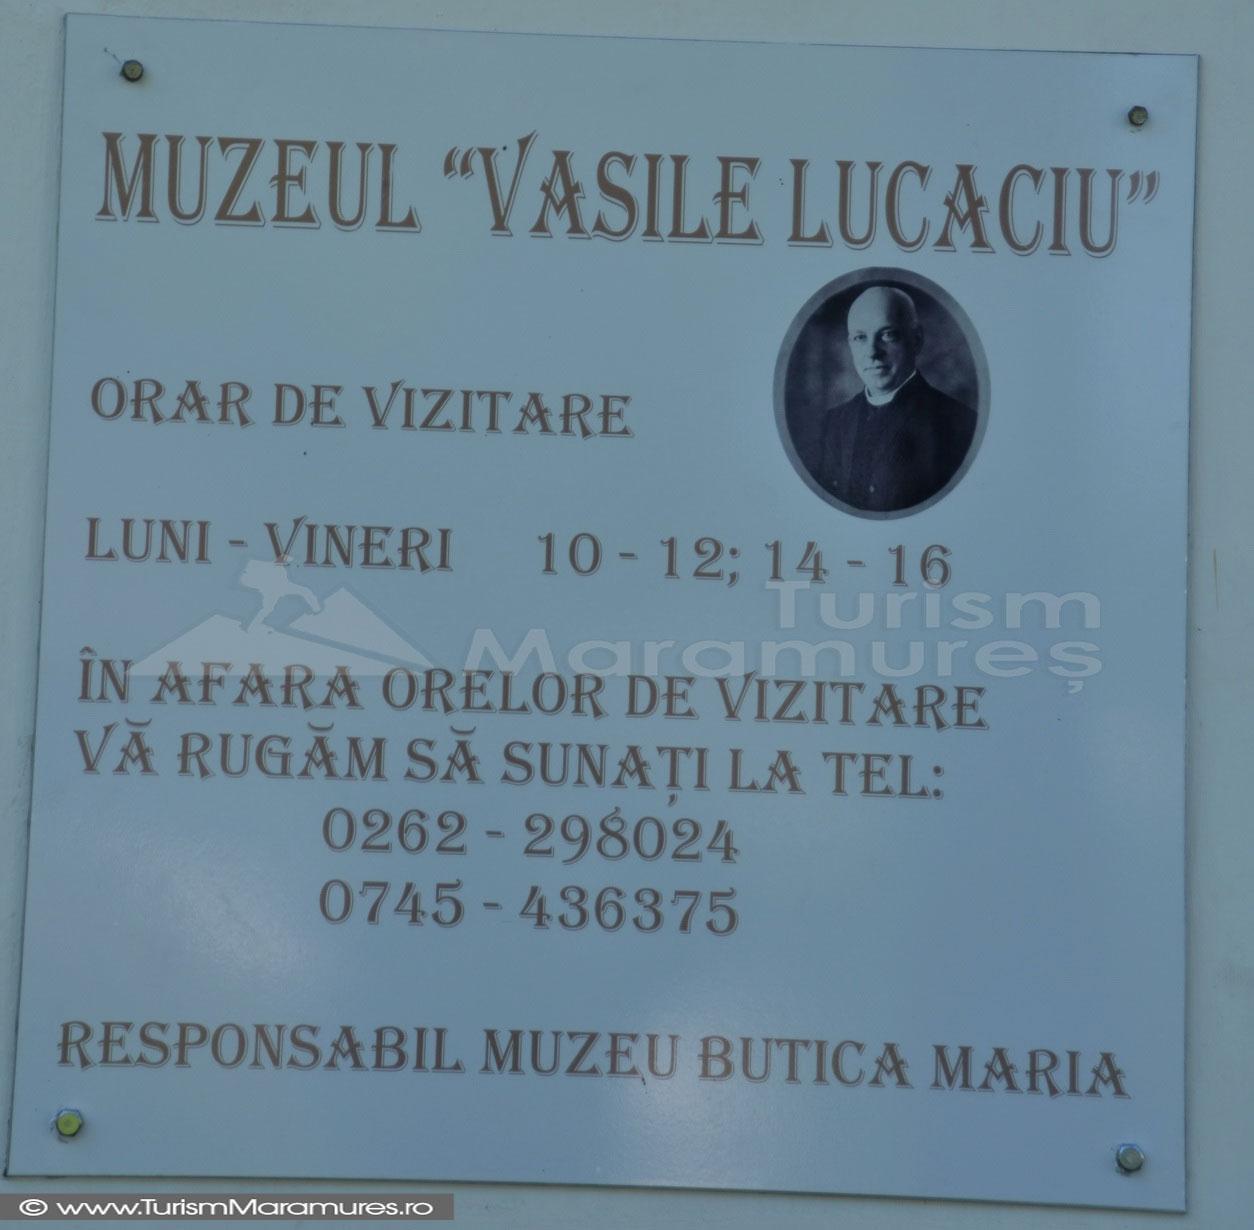 53_Orar-Muzeu-Vasile-Lucaciu